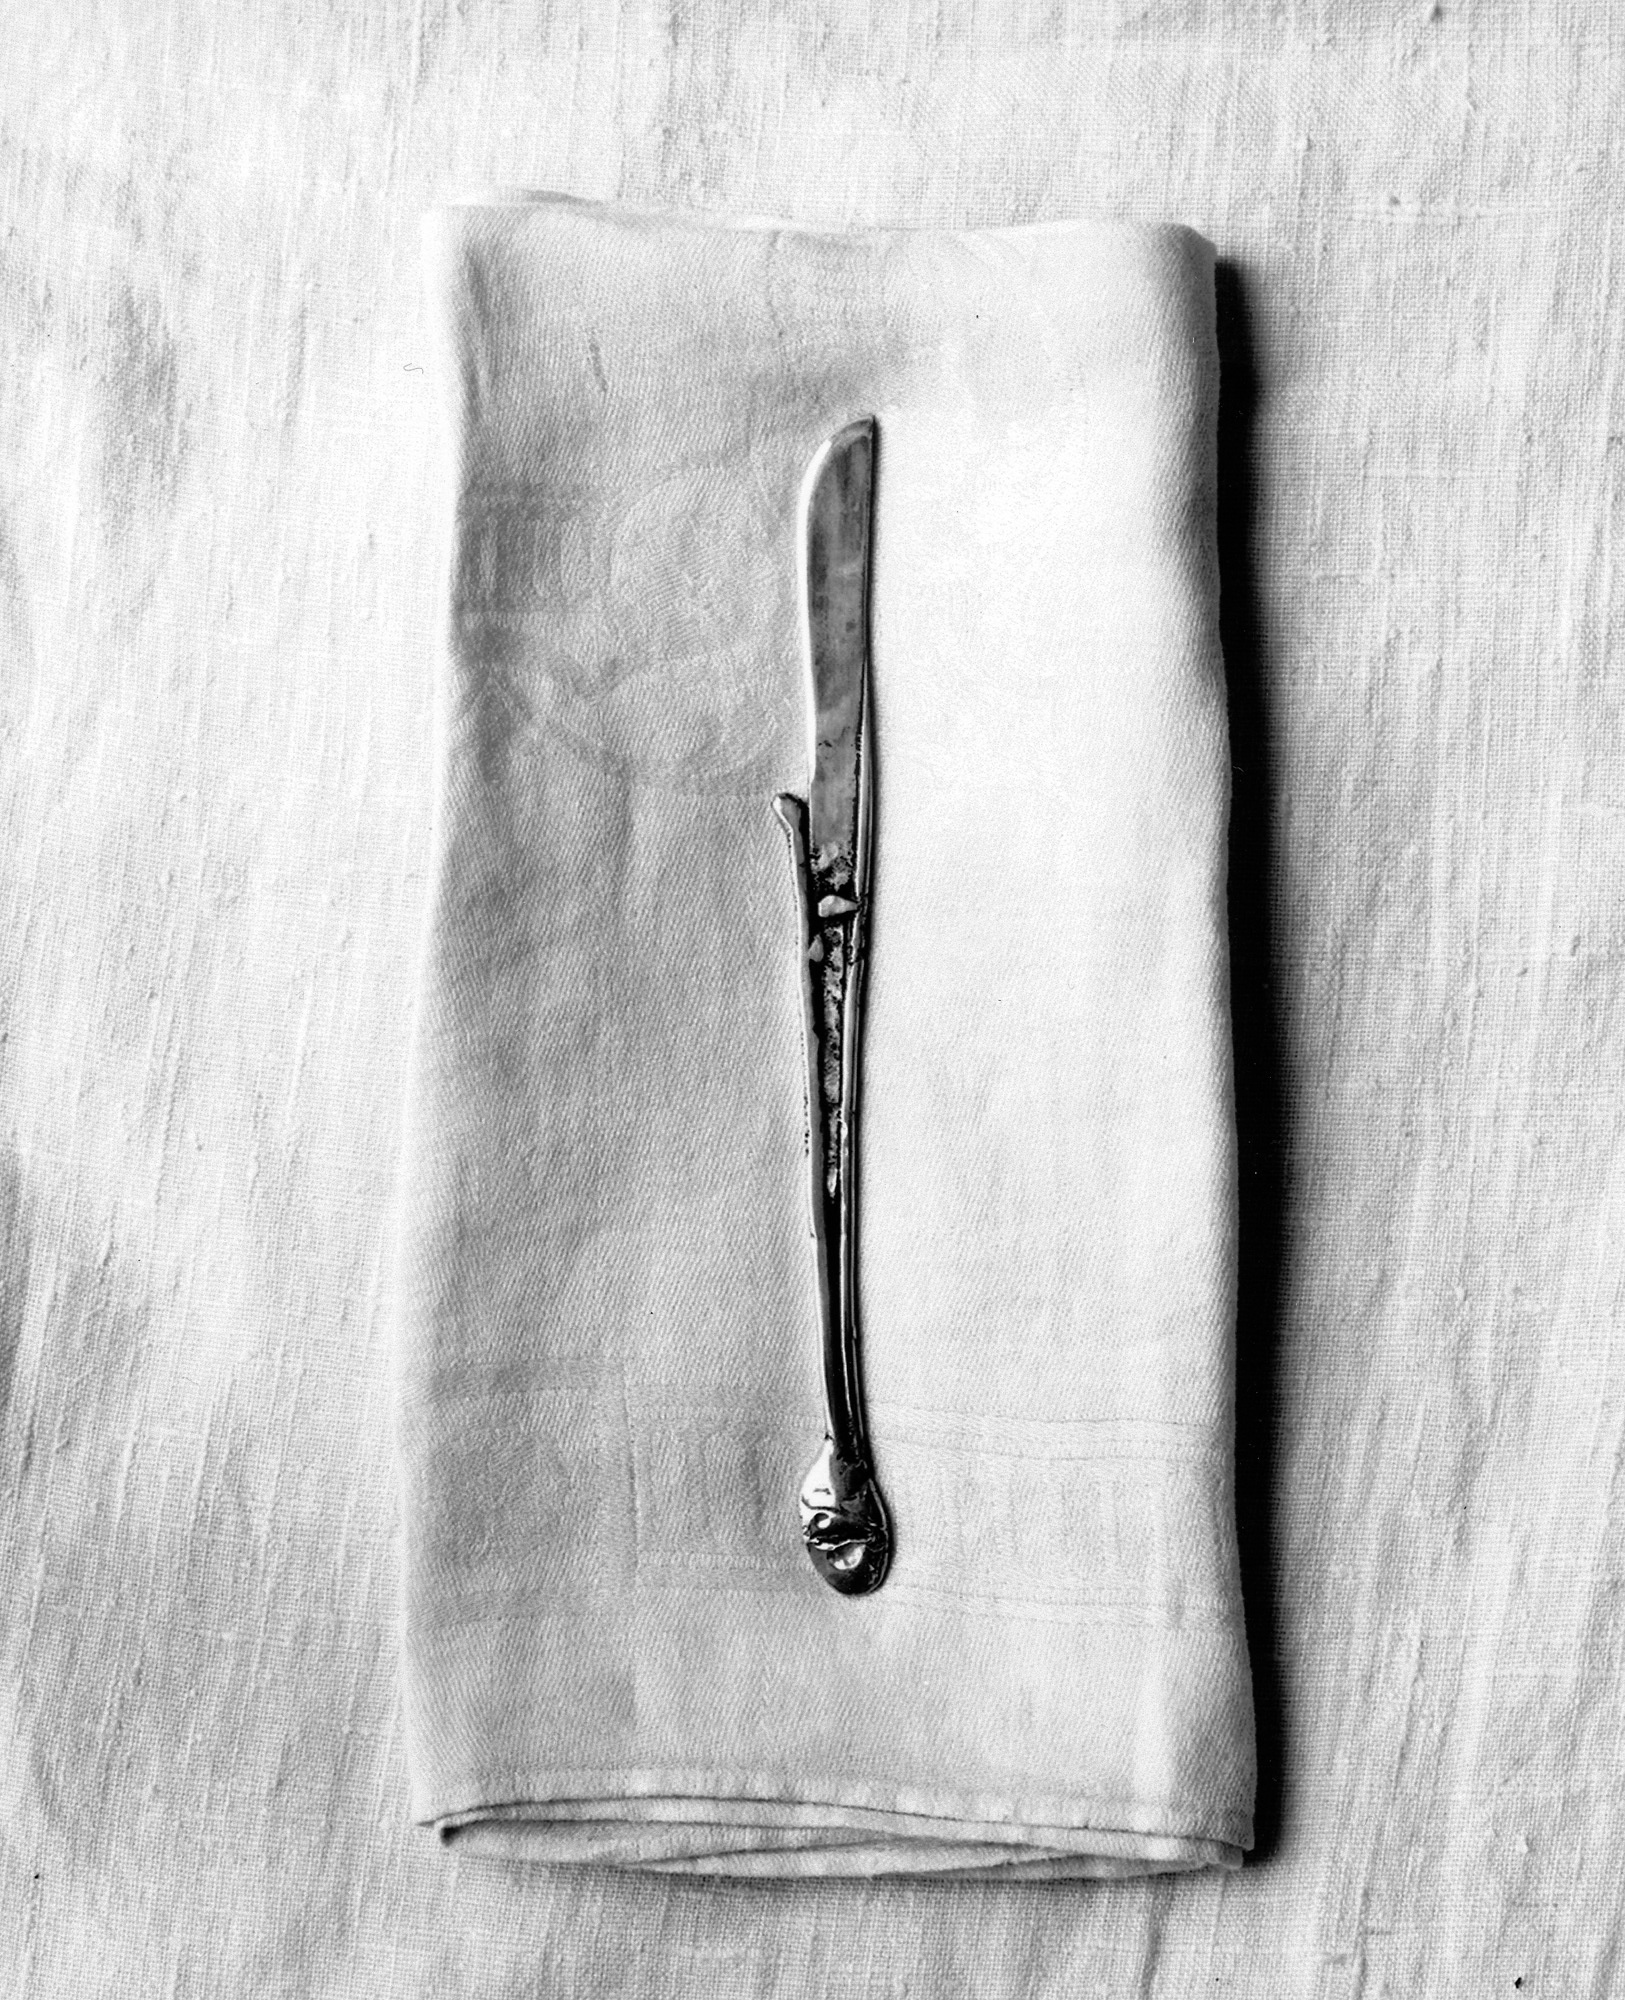 Knife igjbcm